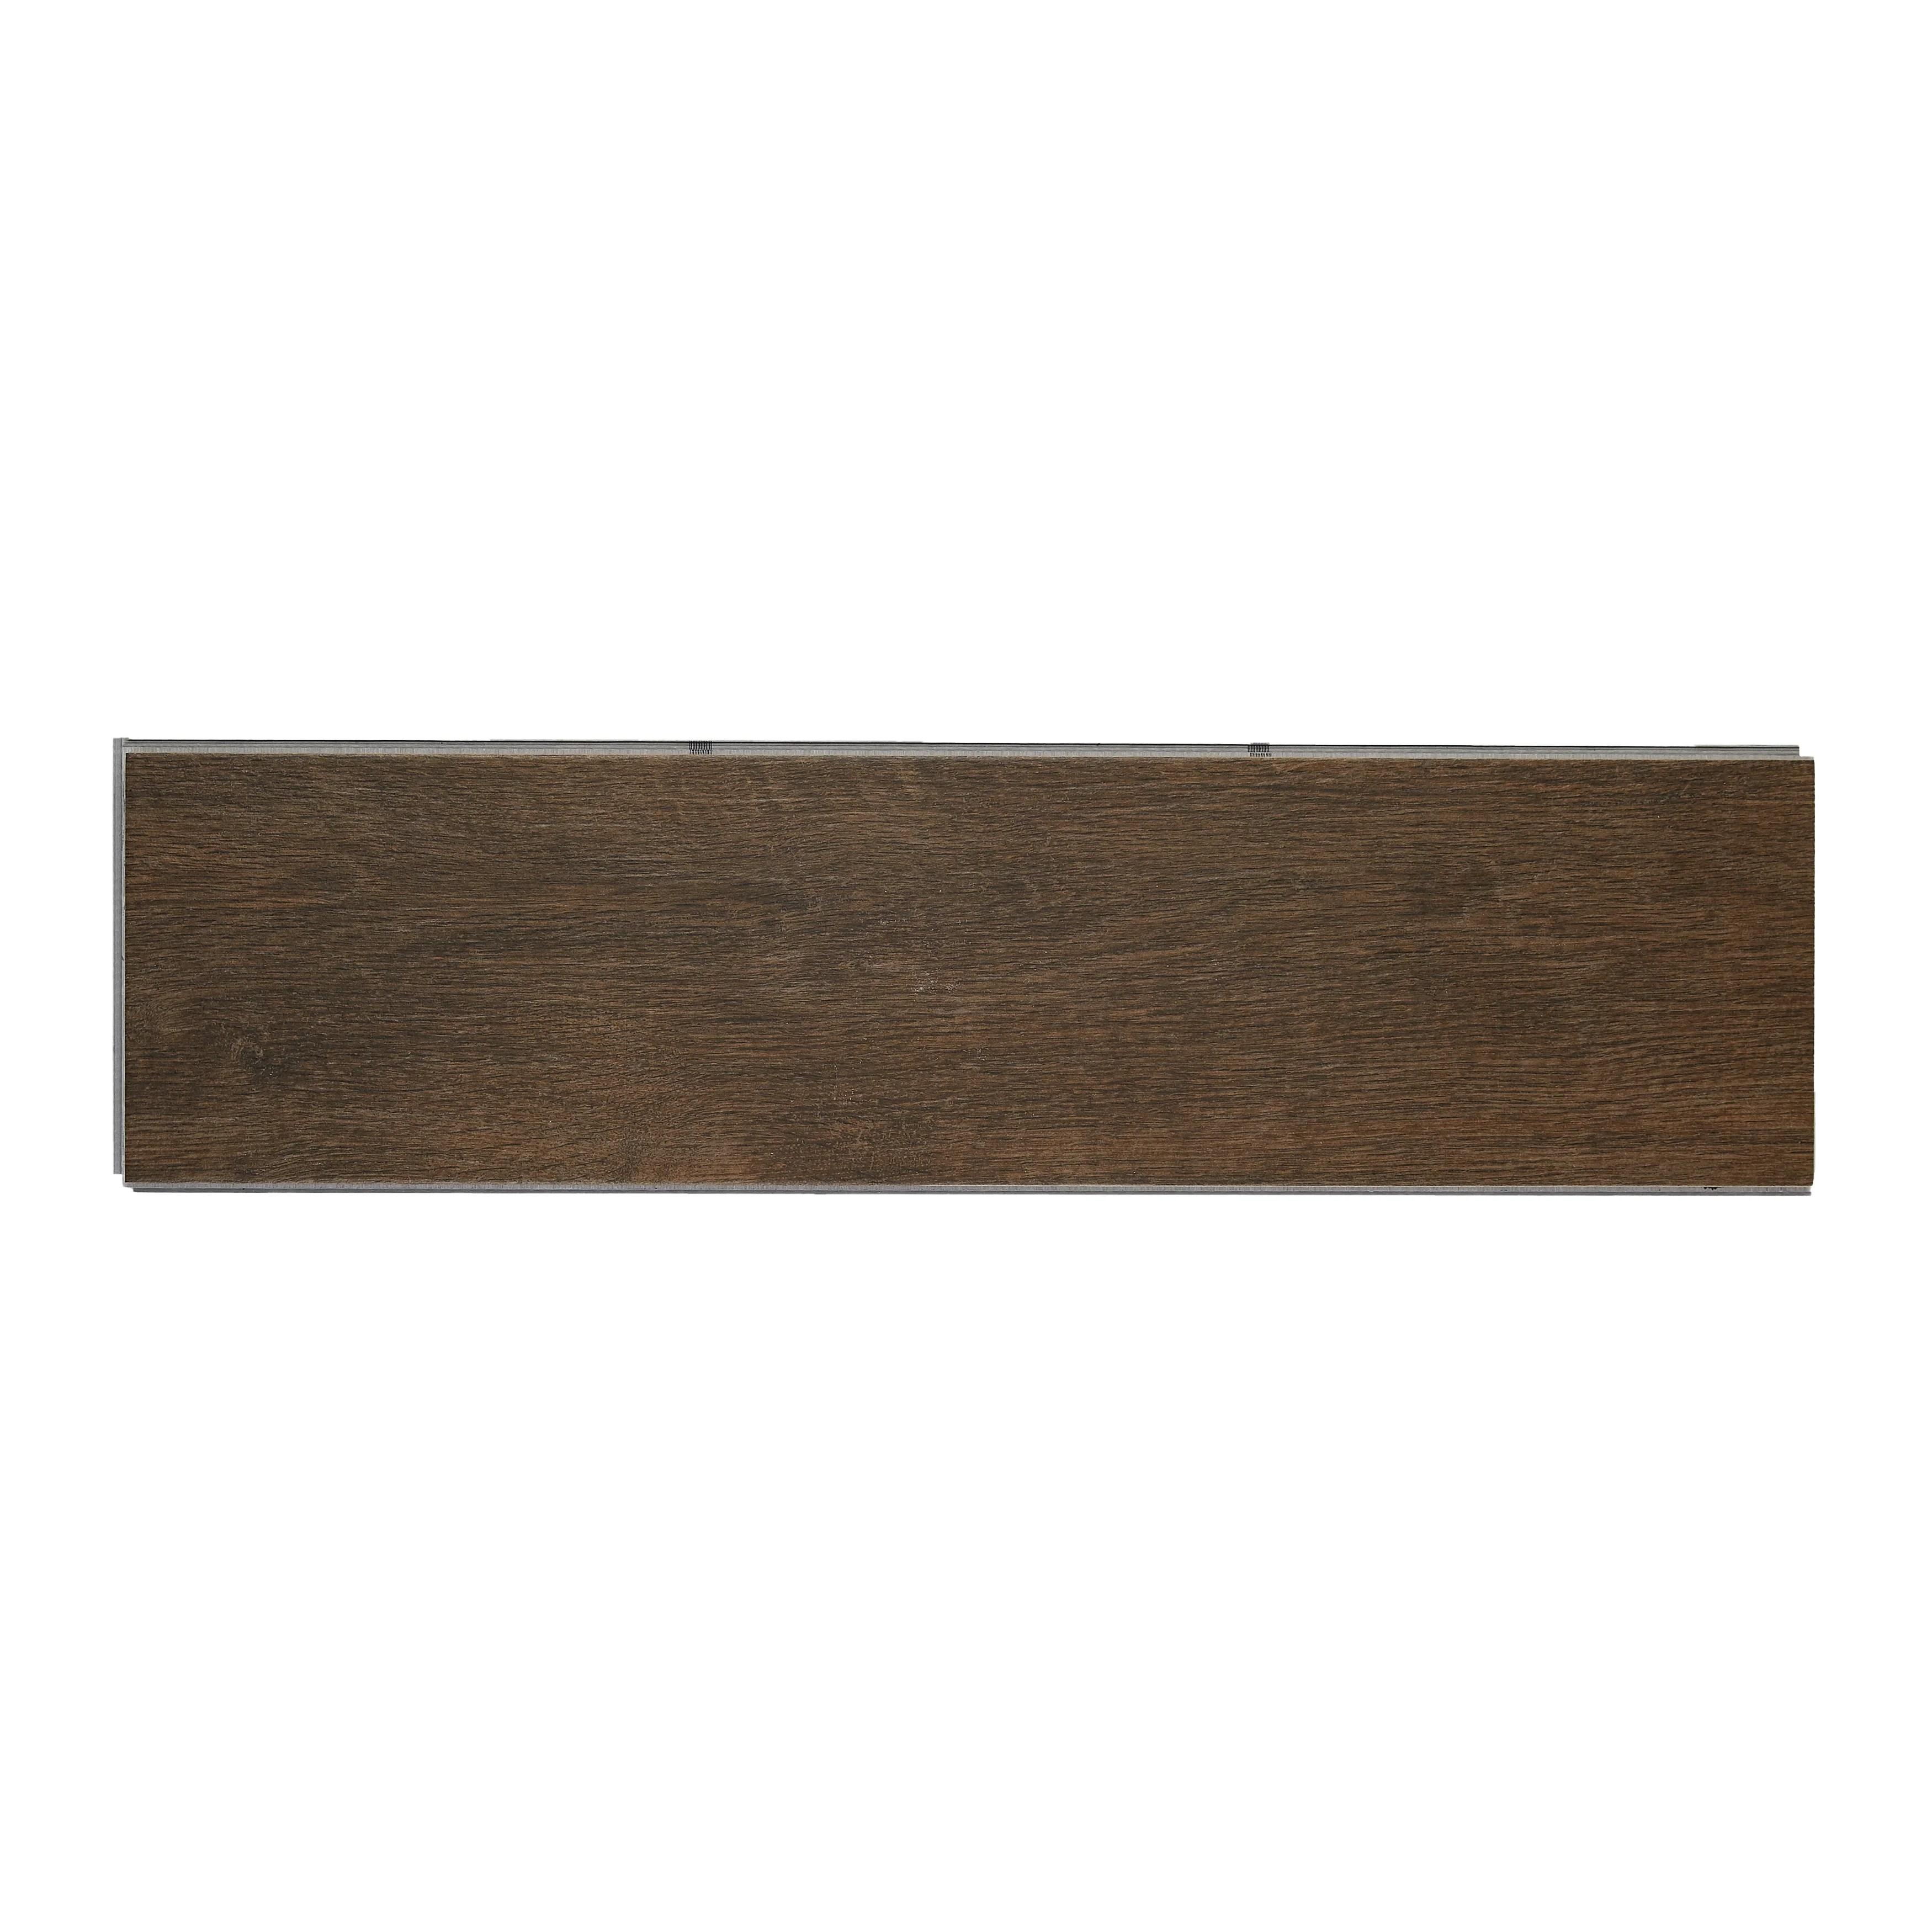 revotile click tile 6 x 24 porcelain wood look wall floor tile